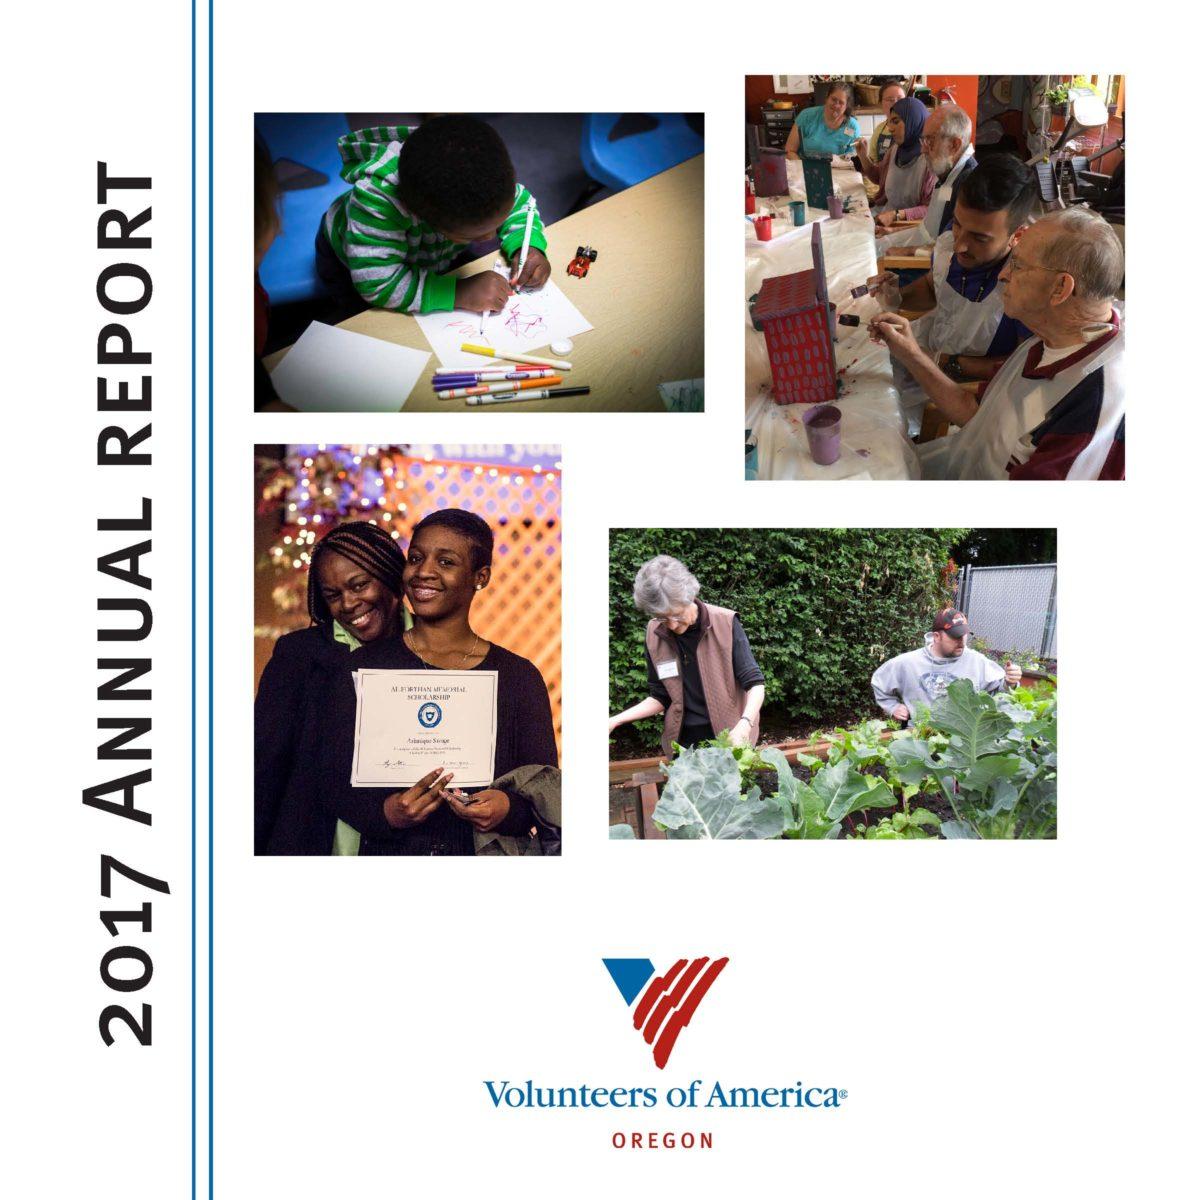 2017 annual report, photo collage